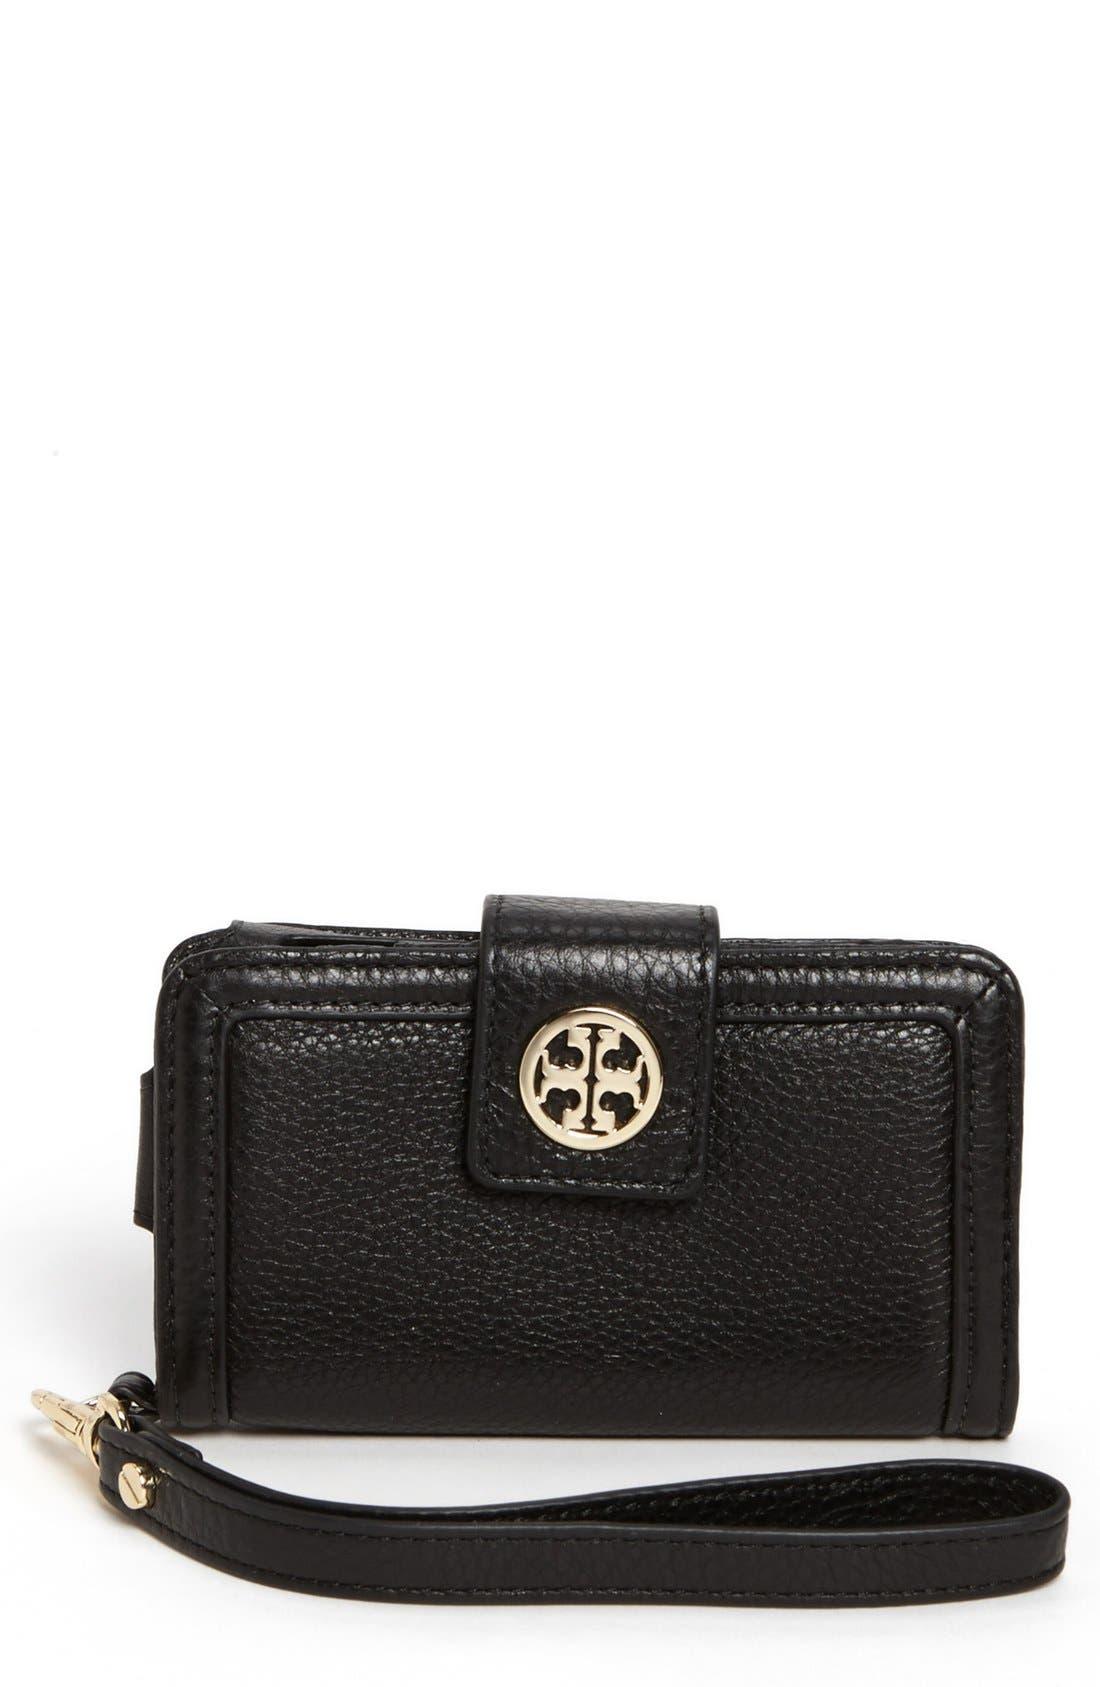 Main Image - Tory Burch 'Amanda' Smartphone Wallet